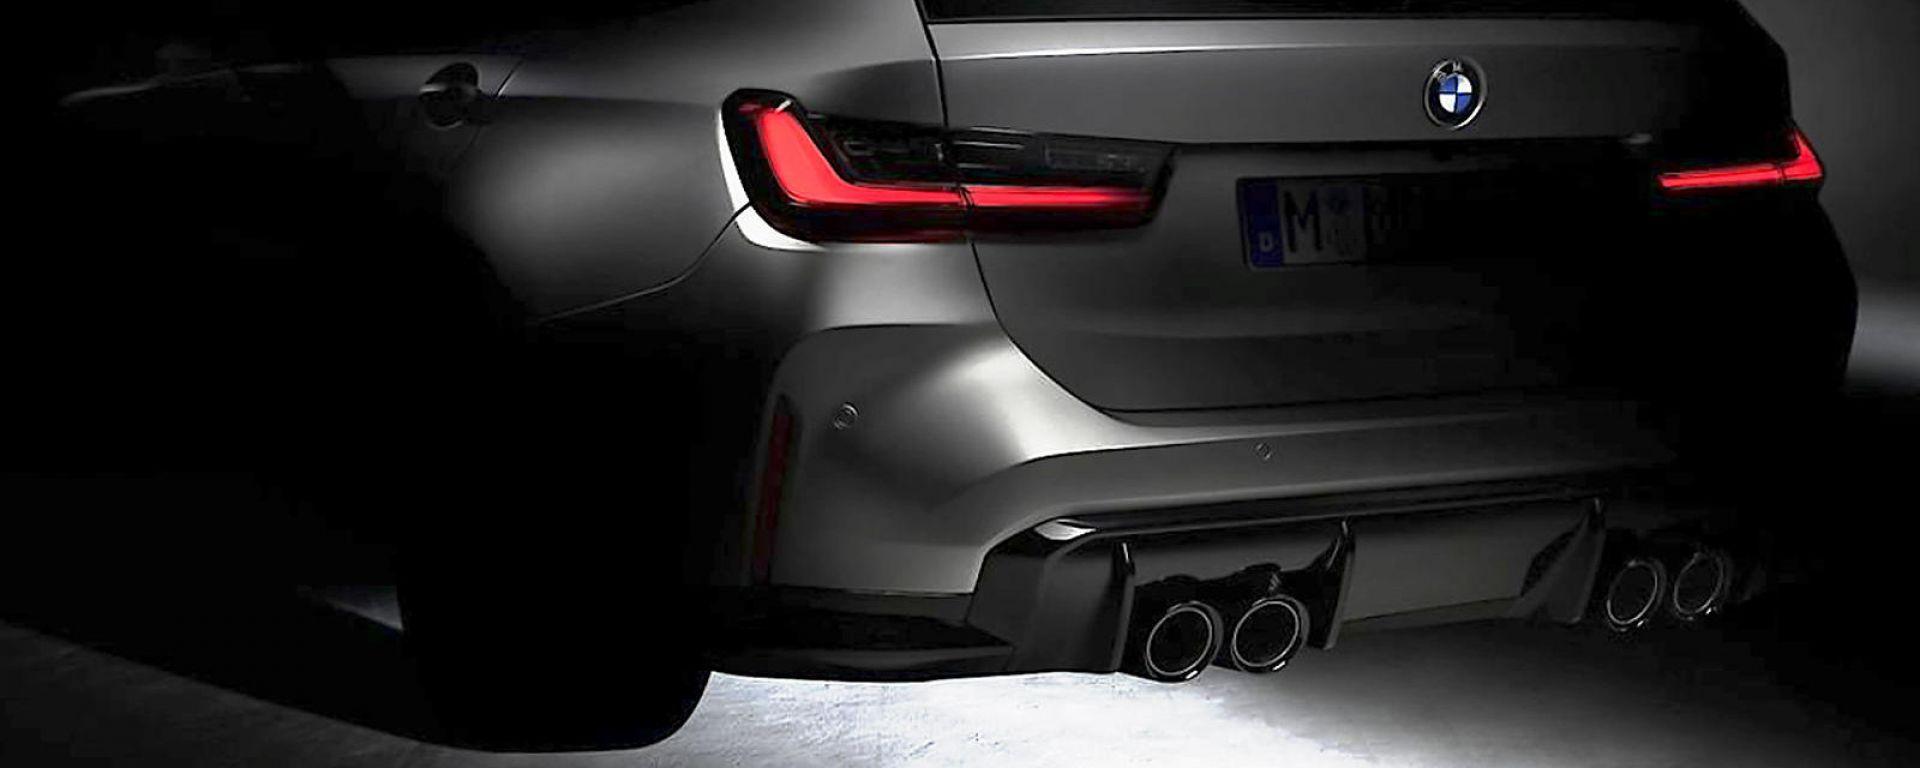 BMW M3 Touring, primo teaser